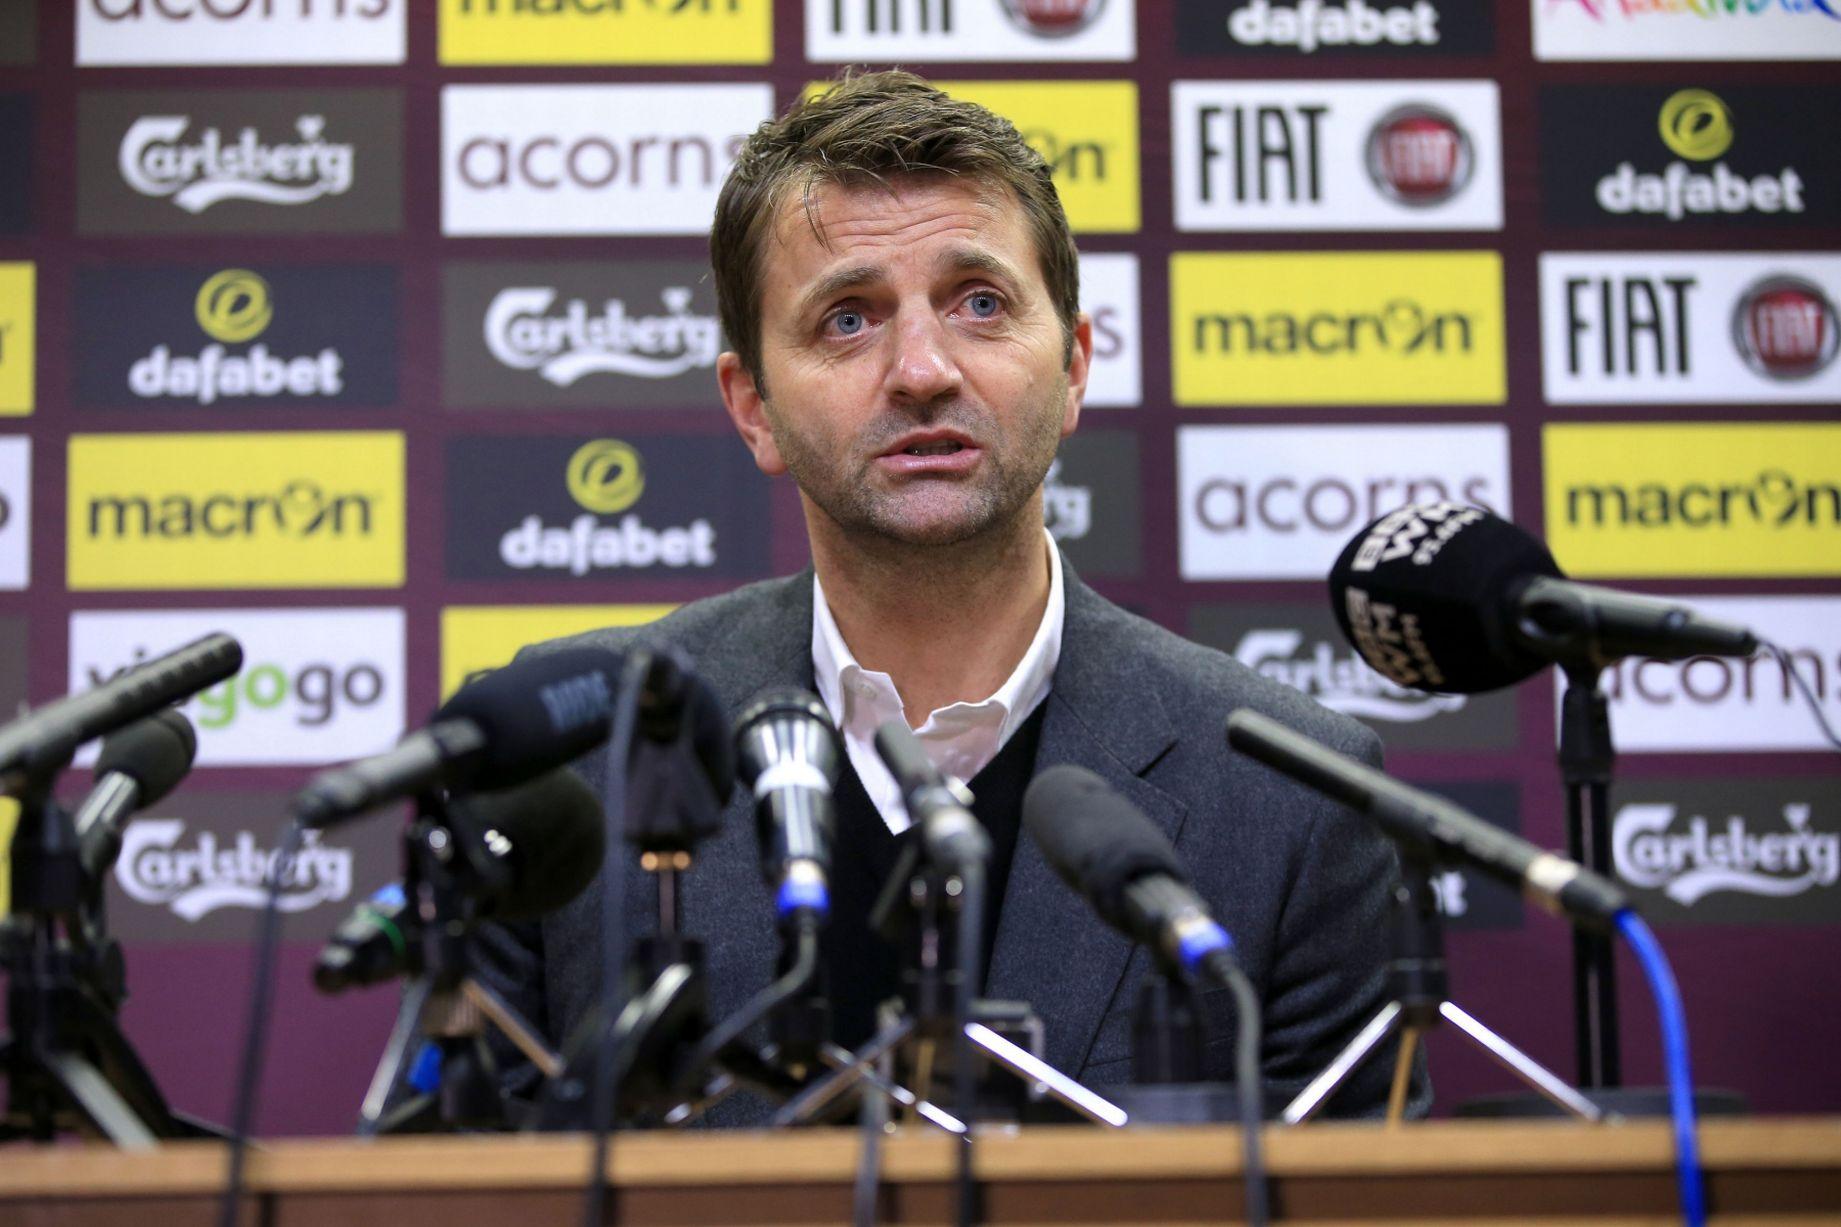 Aston Villa looks like a different team under Tim Sherwood